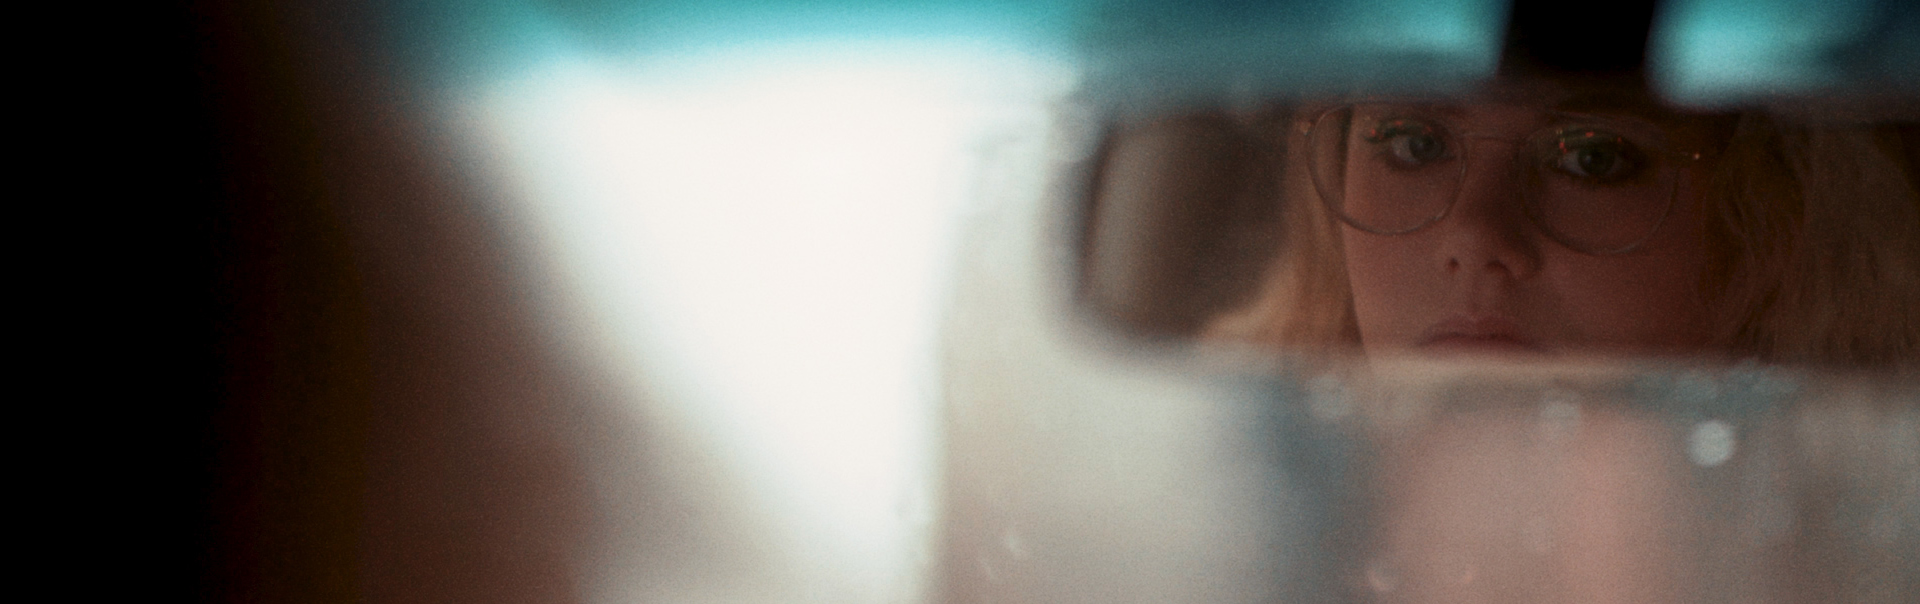 Untitled-40.jpg